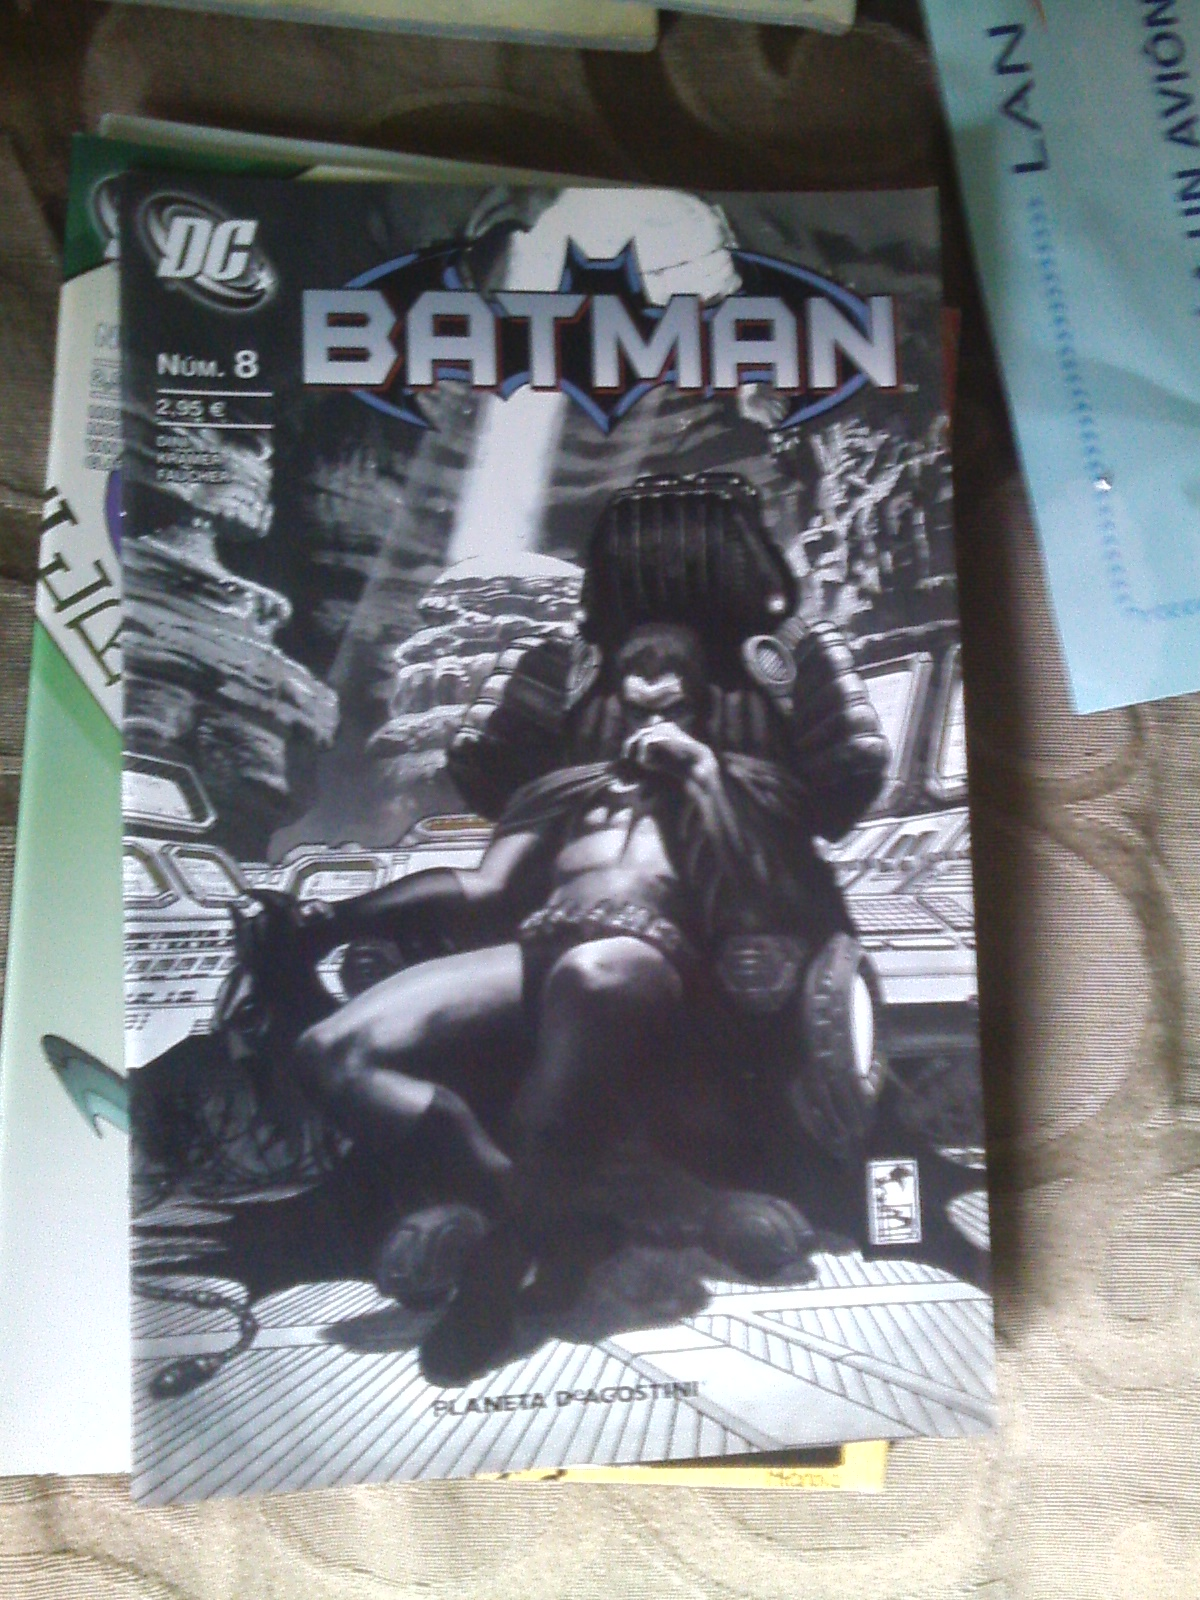 [Comics] Siguen las adquisiciones 2015 - Página 9 CAM05272